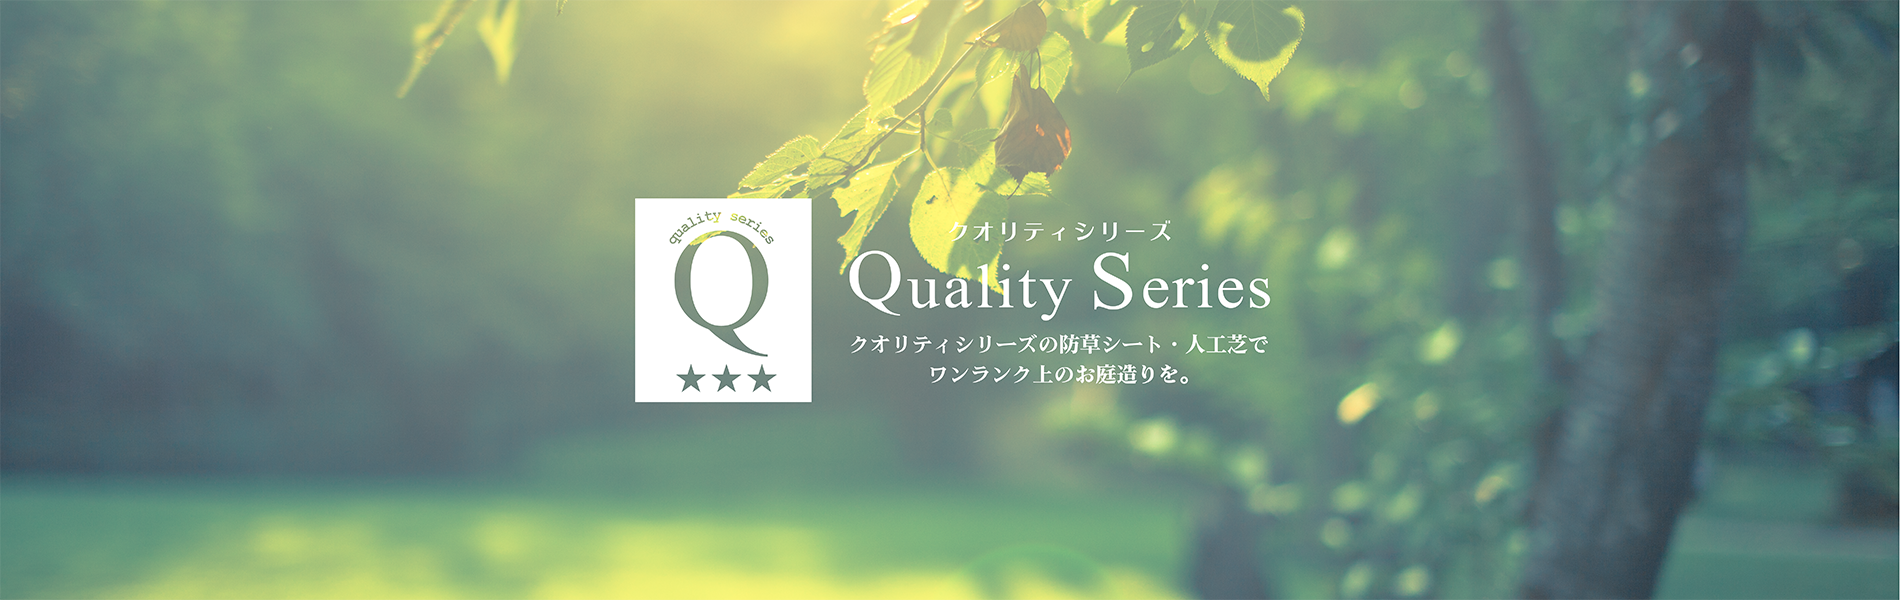 Quality Series -クオリティシリーズ-